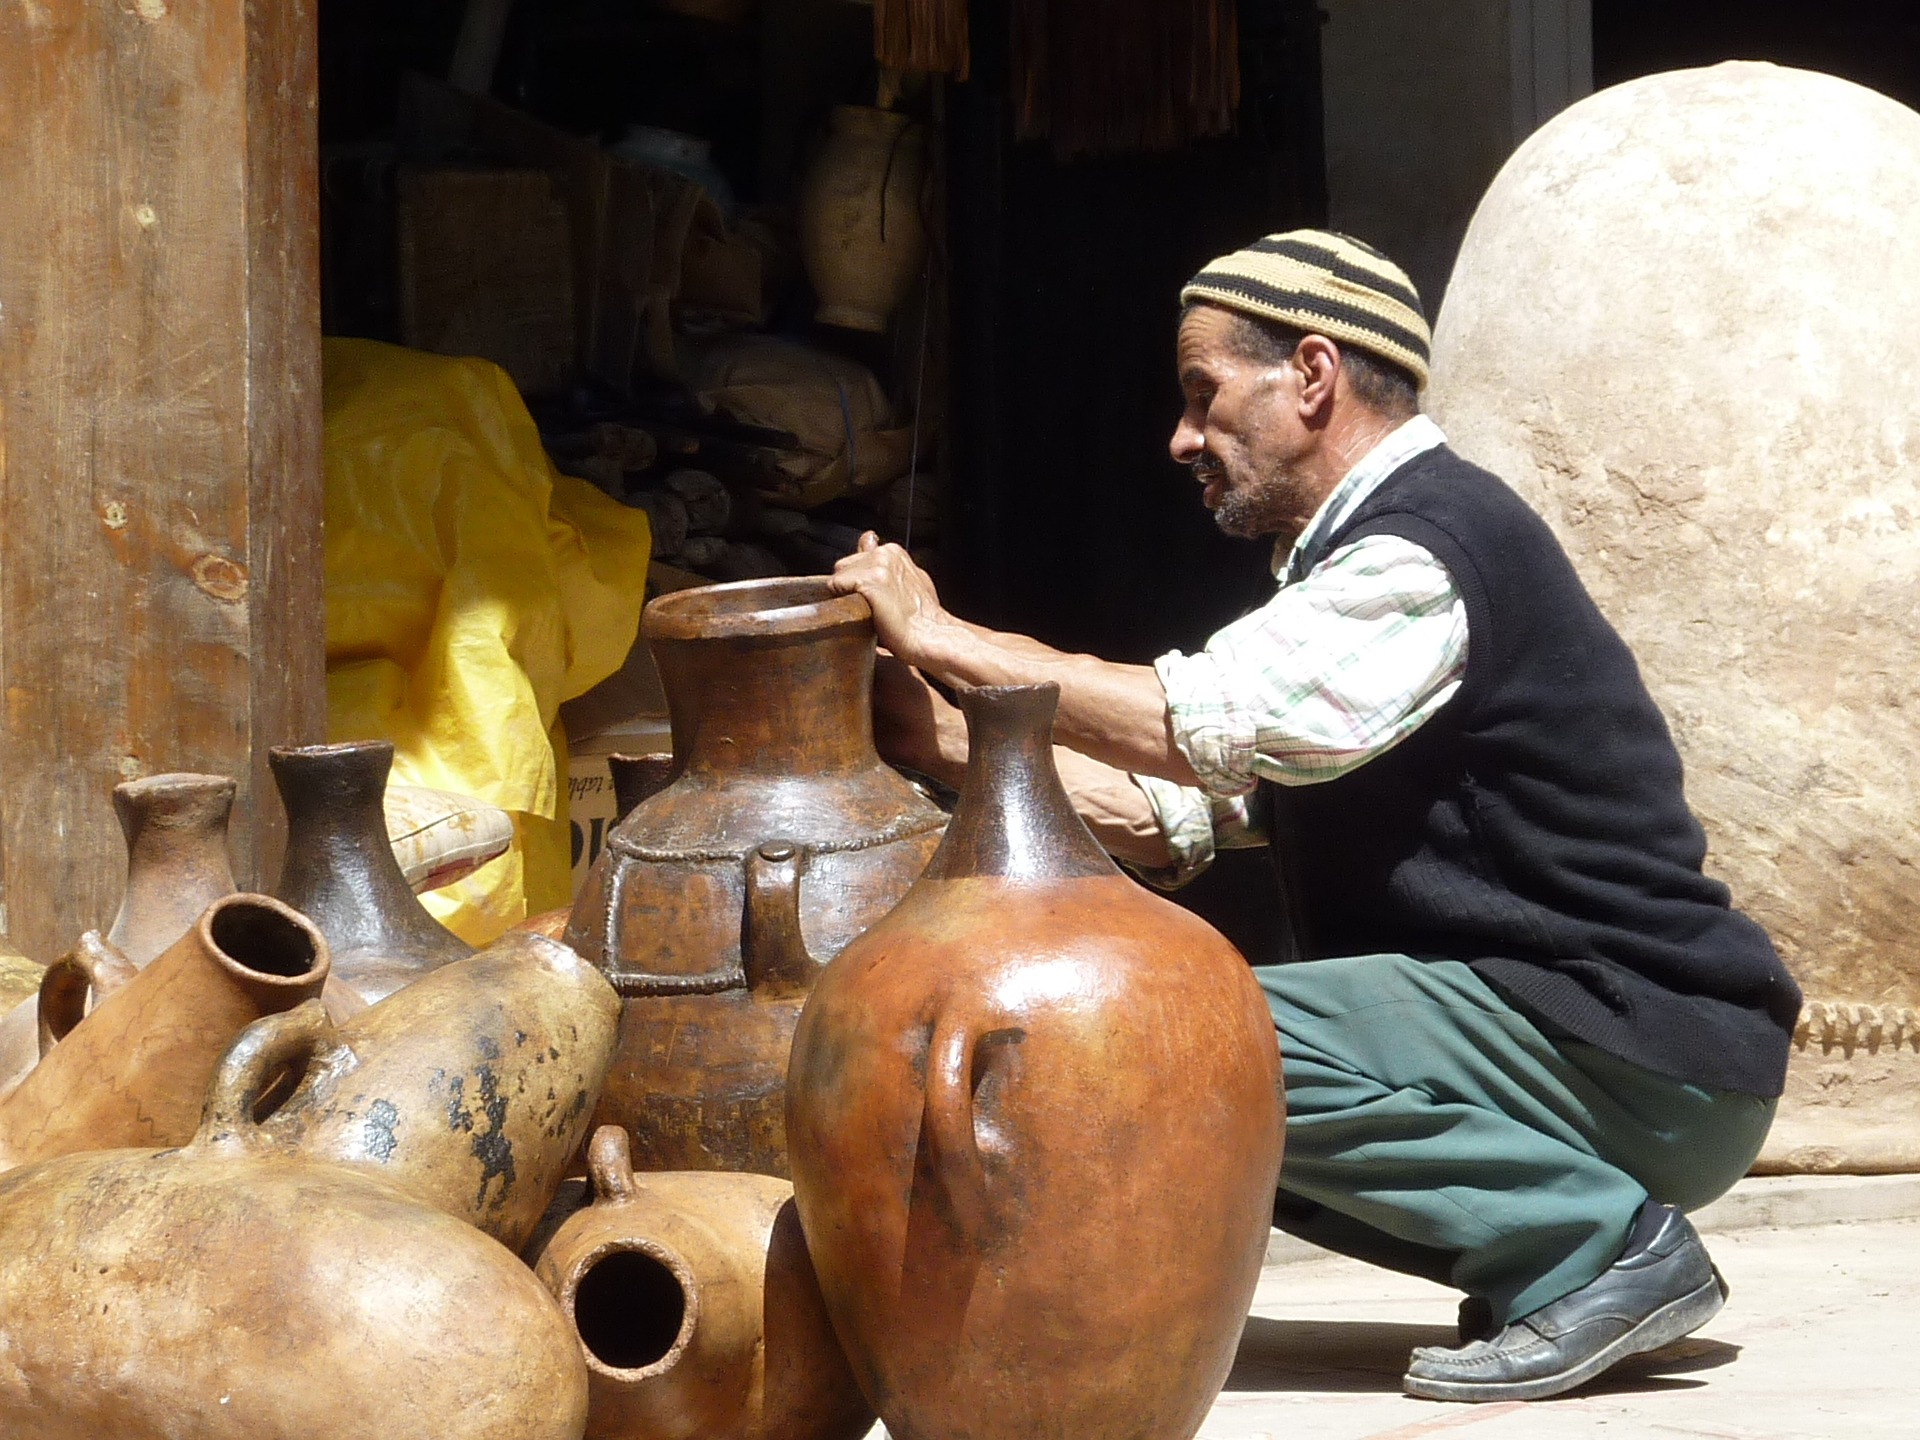 morocco-2689794_1920